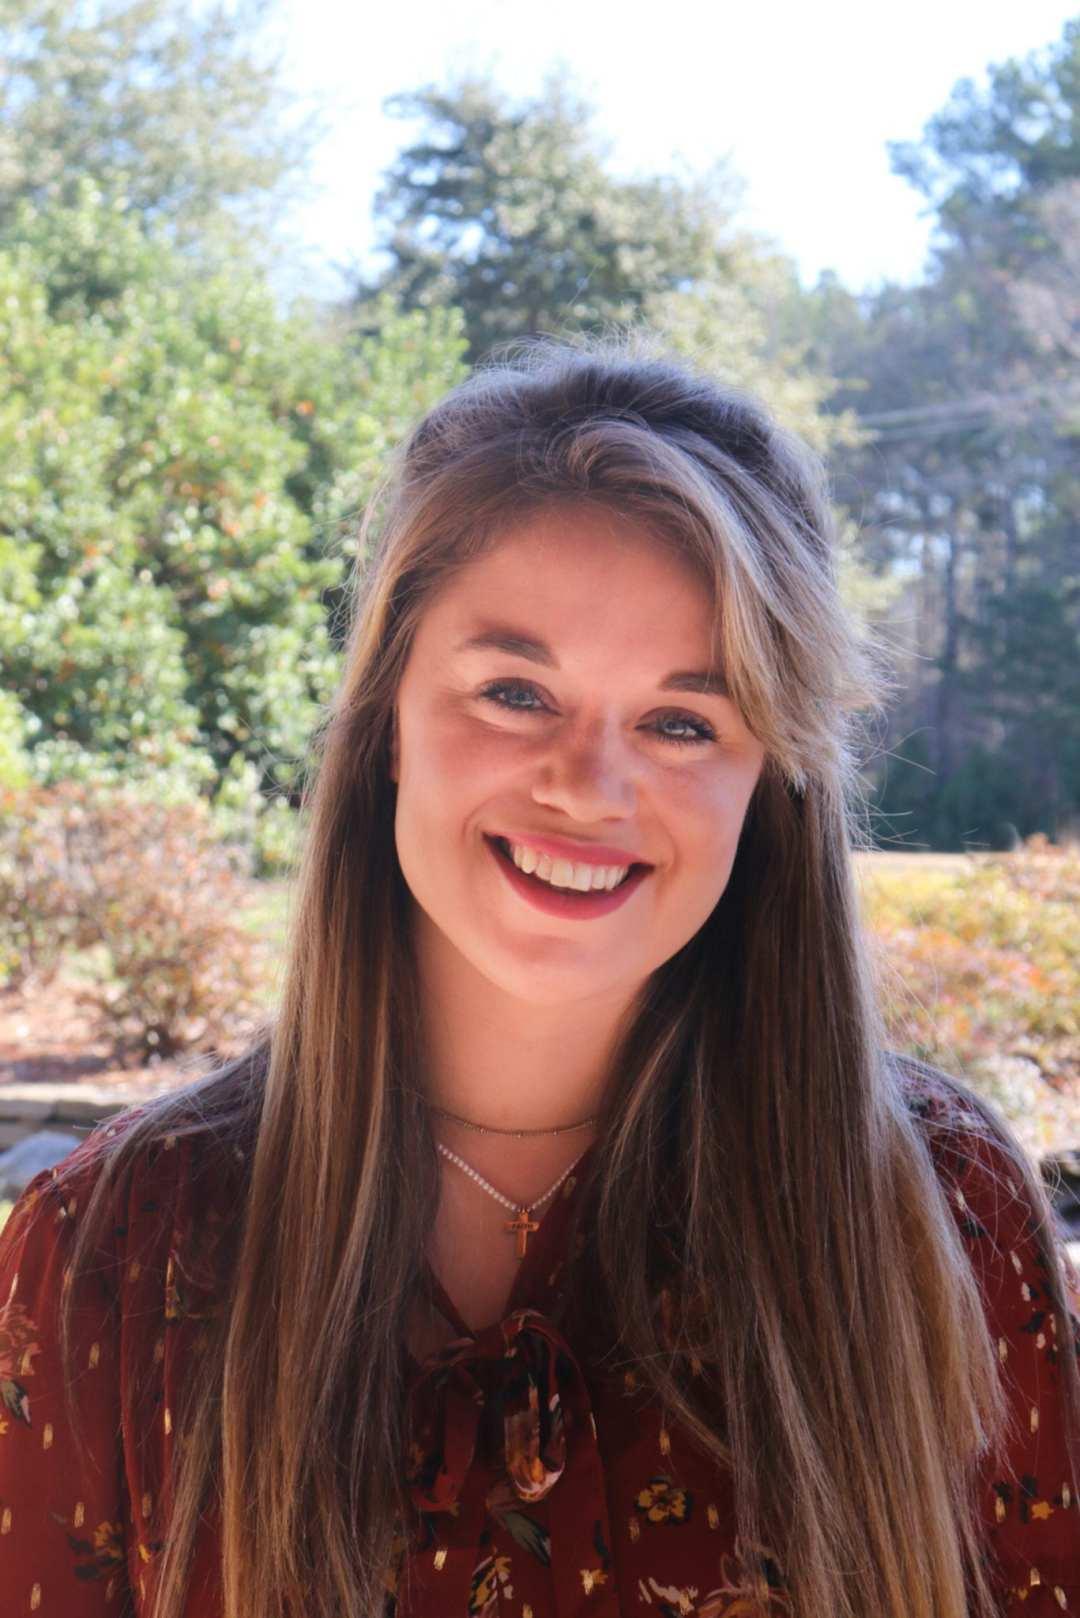 Amy Austin, Assistant Program Director & On-Air Host